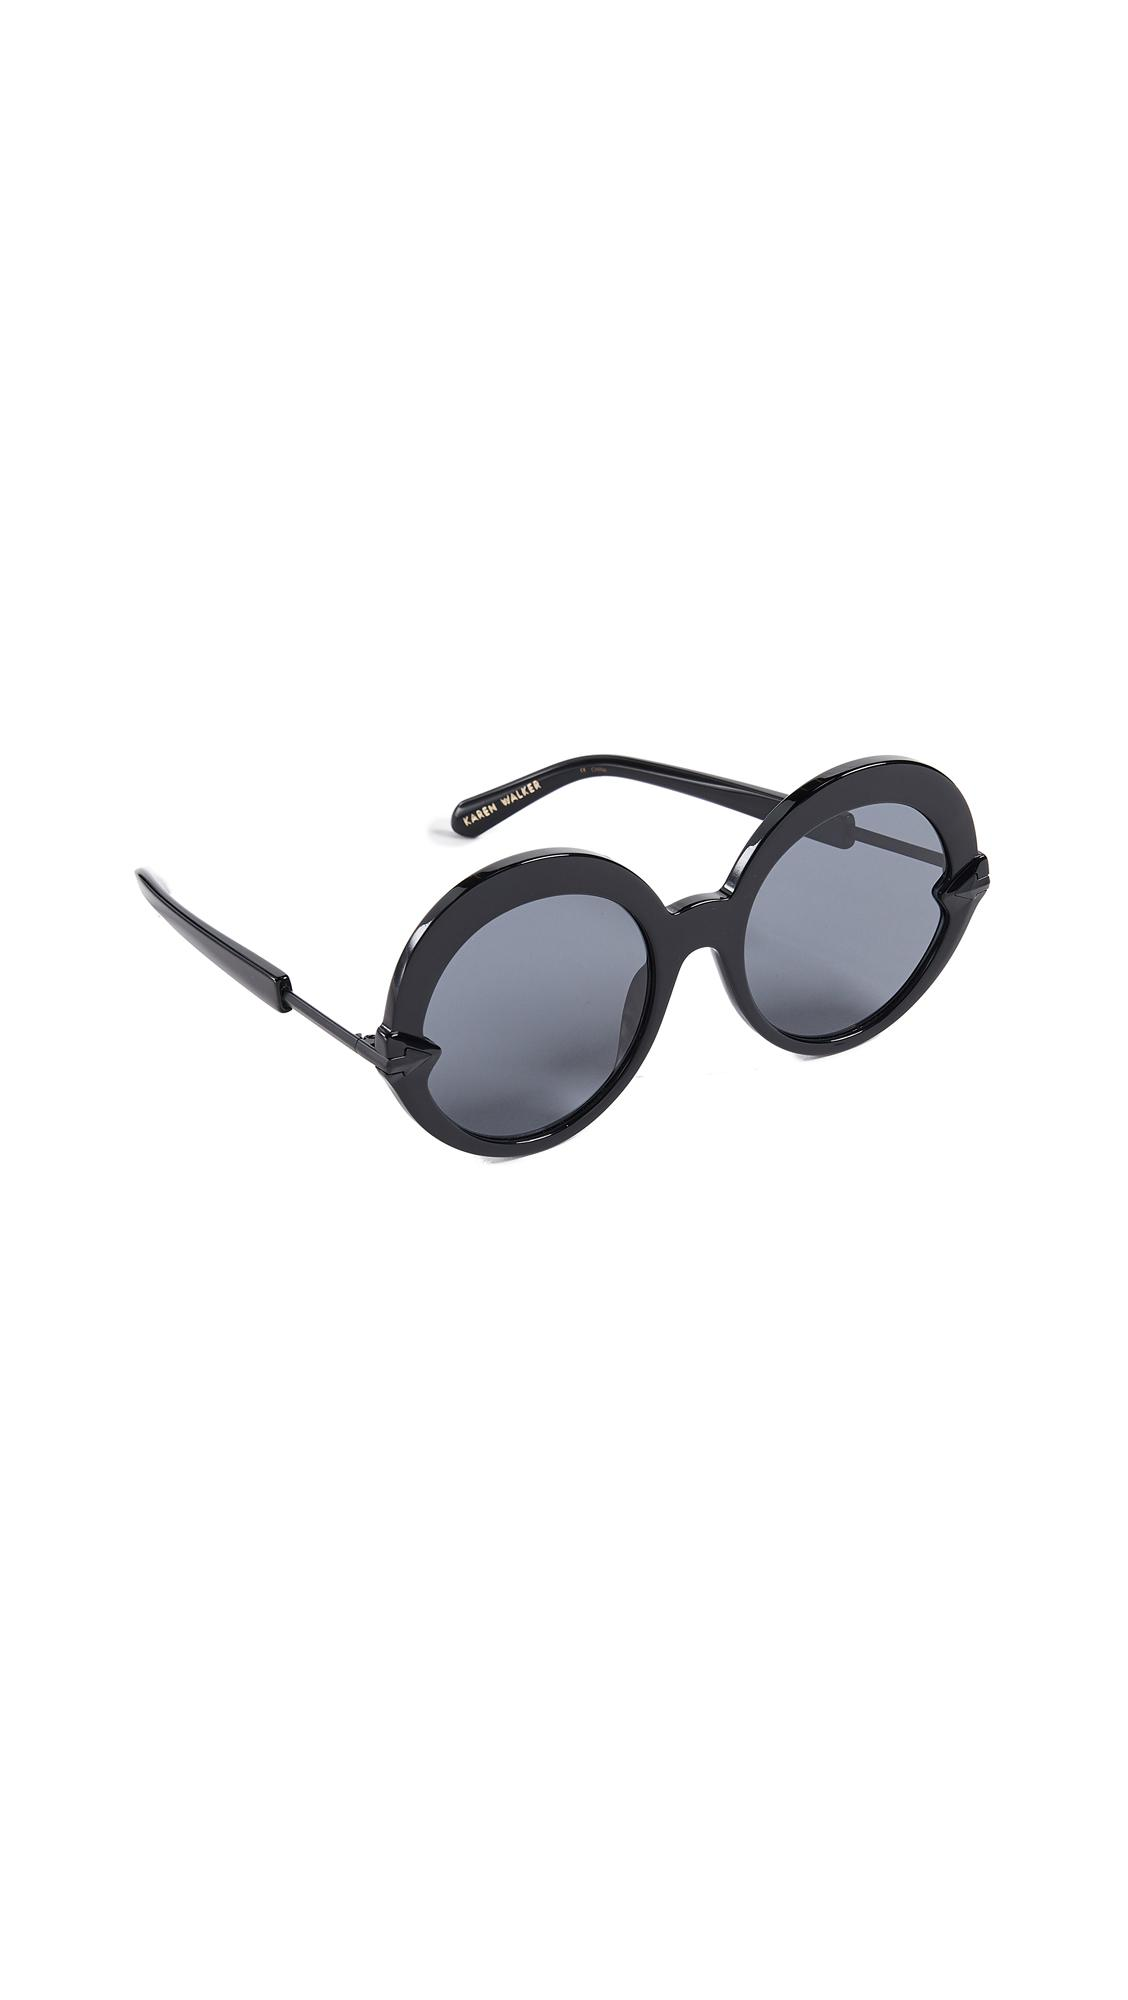 ac068c60dd Karen Walker - Black Romancer Sunglasses - Lyst. View fullscreen